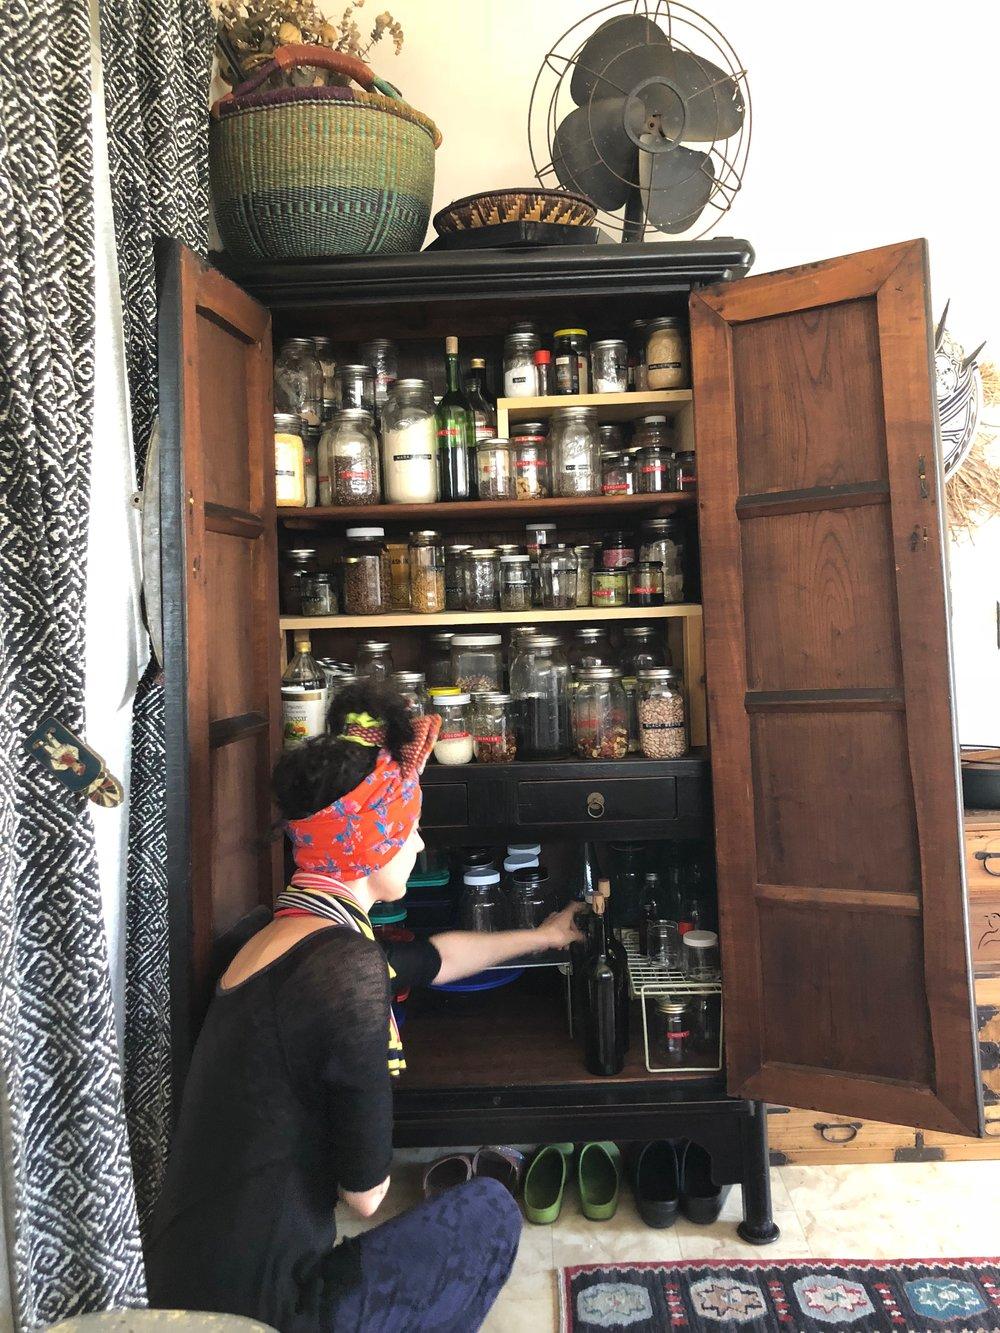 Corinne's pantry